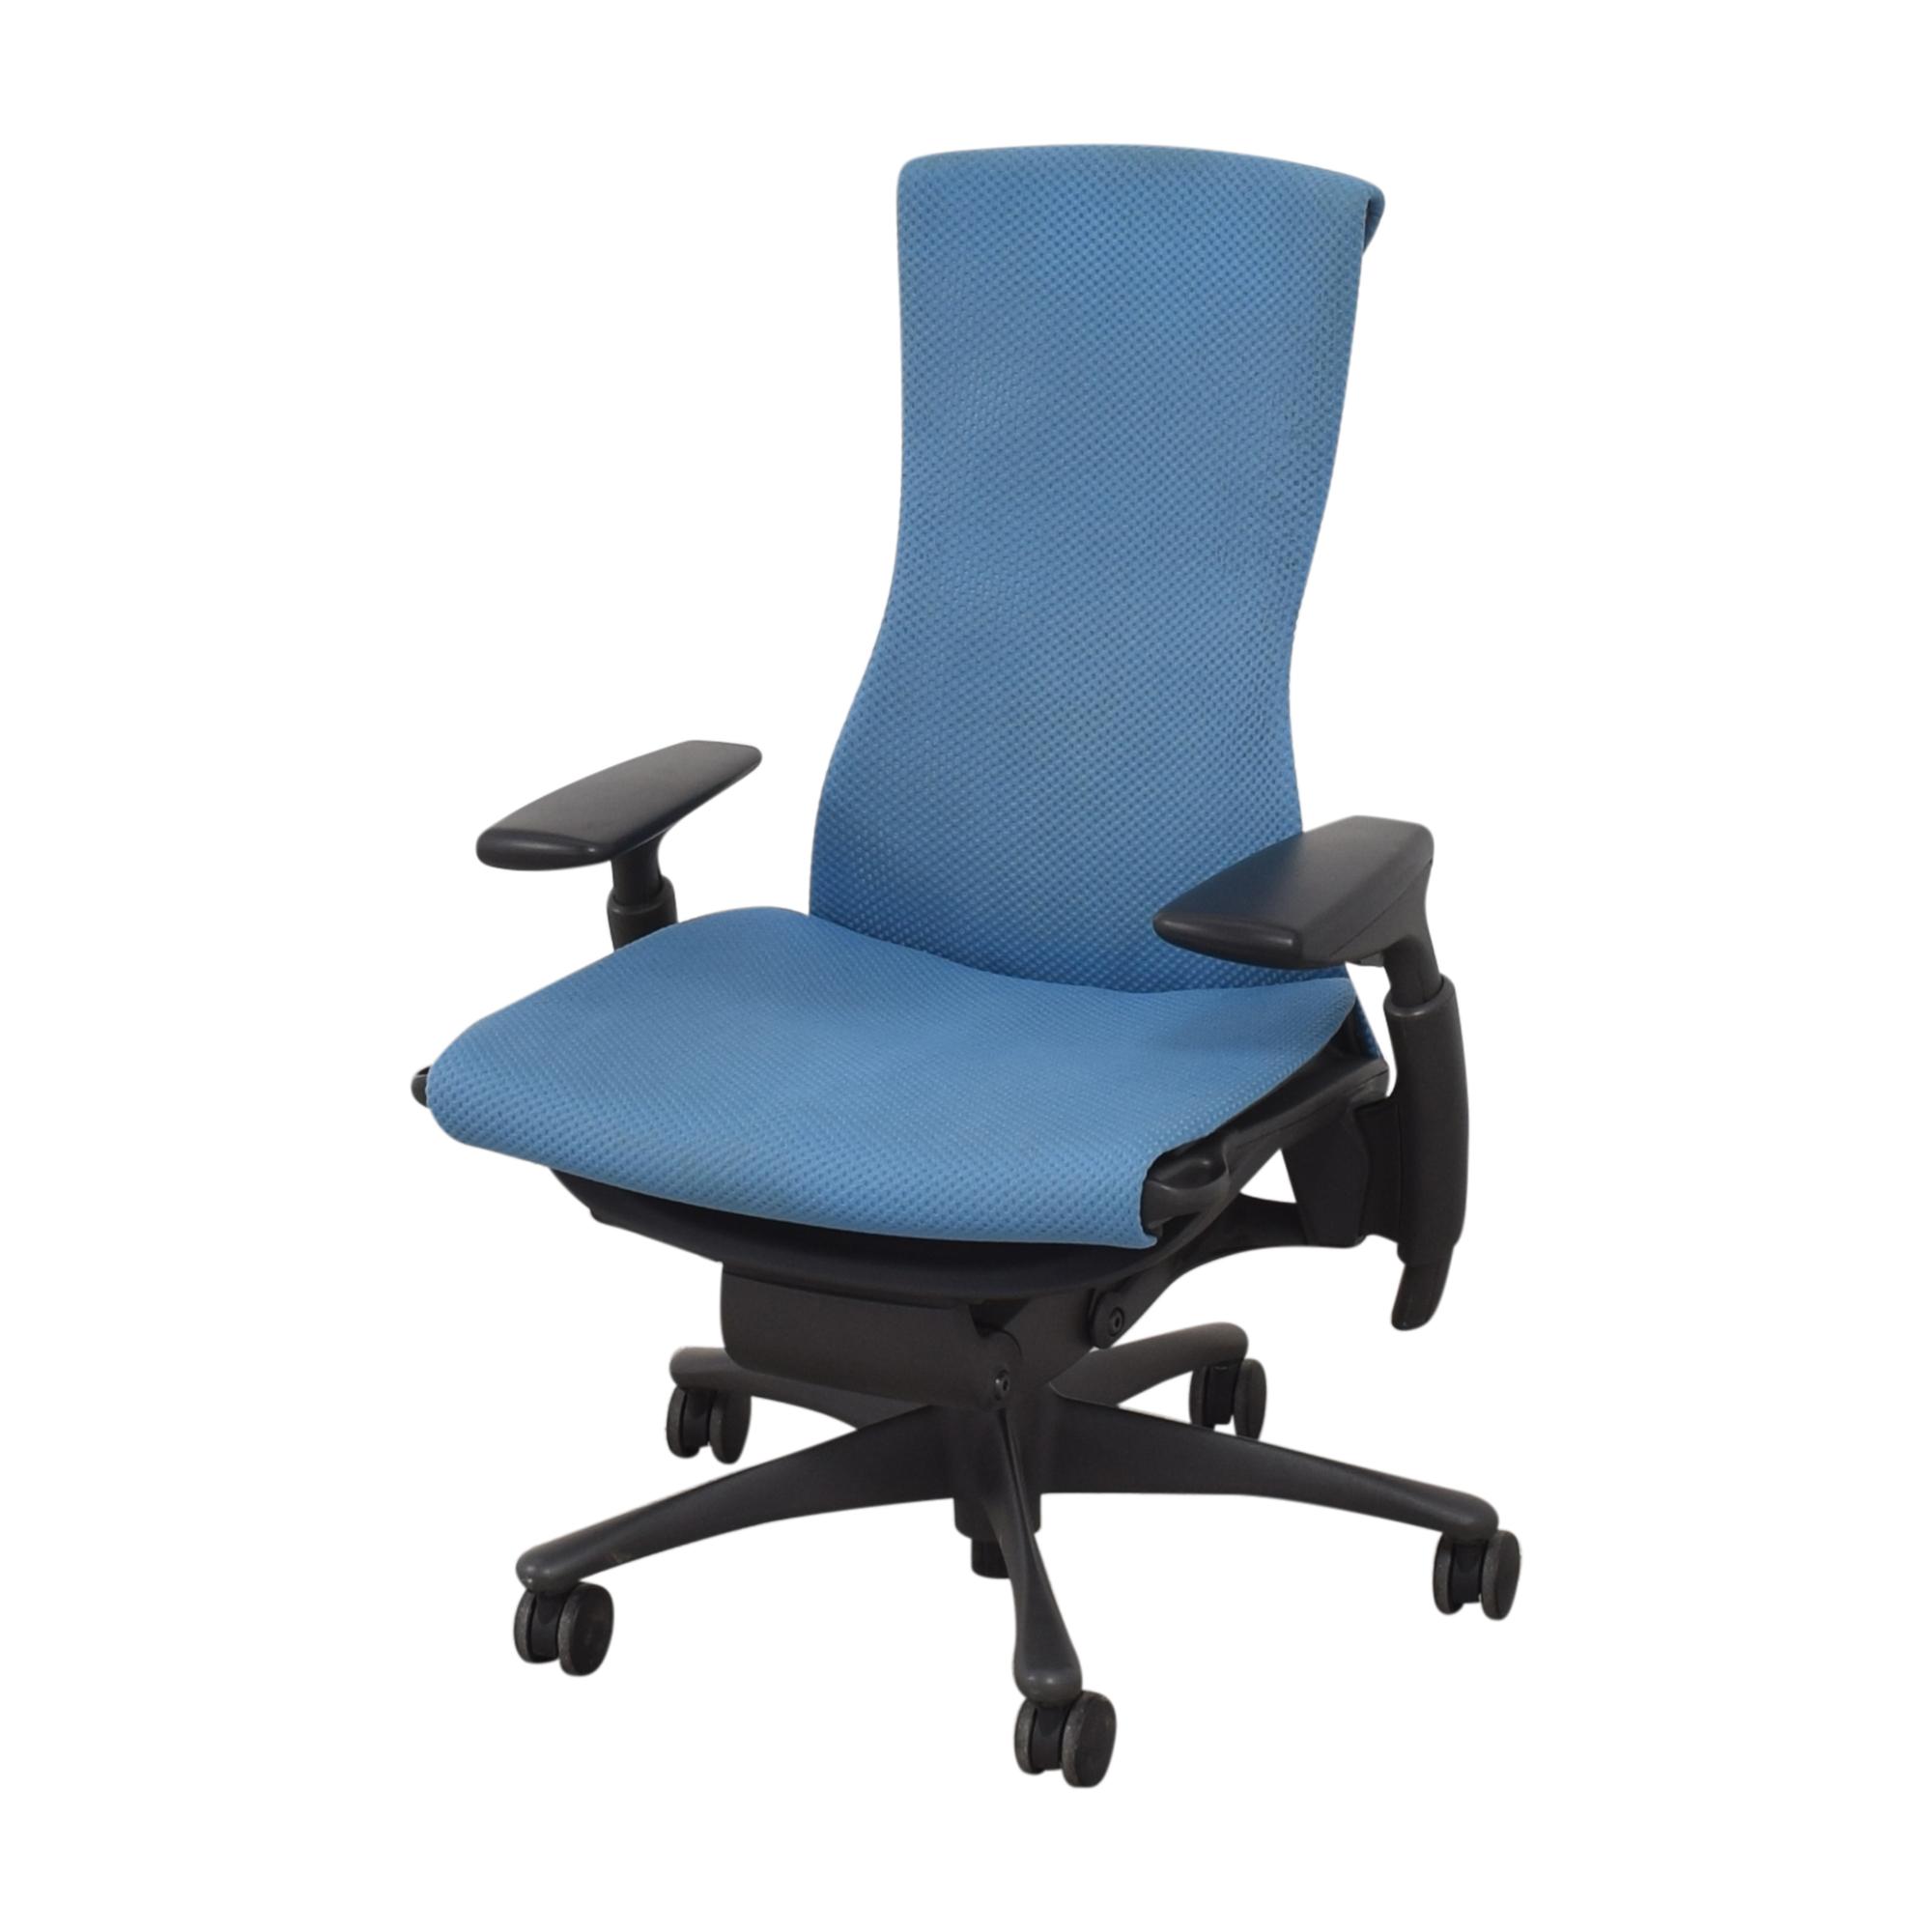 Herman Miller Herman Miller Embody Chair for sale